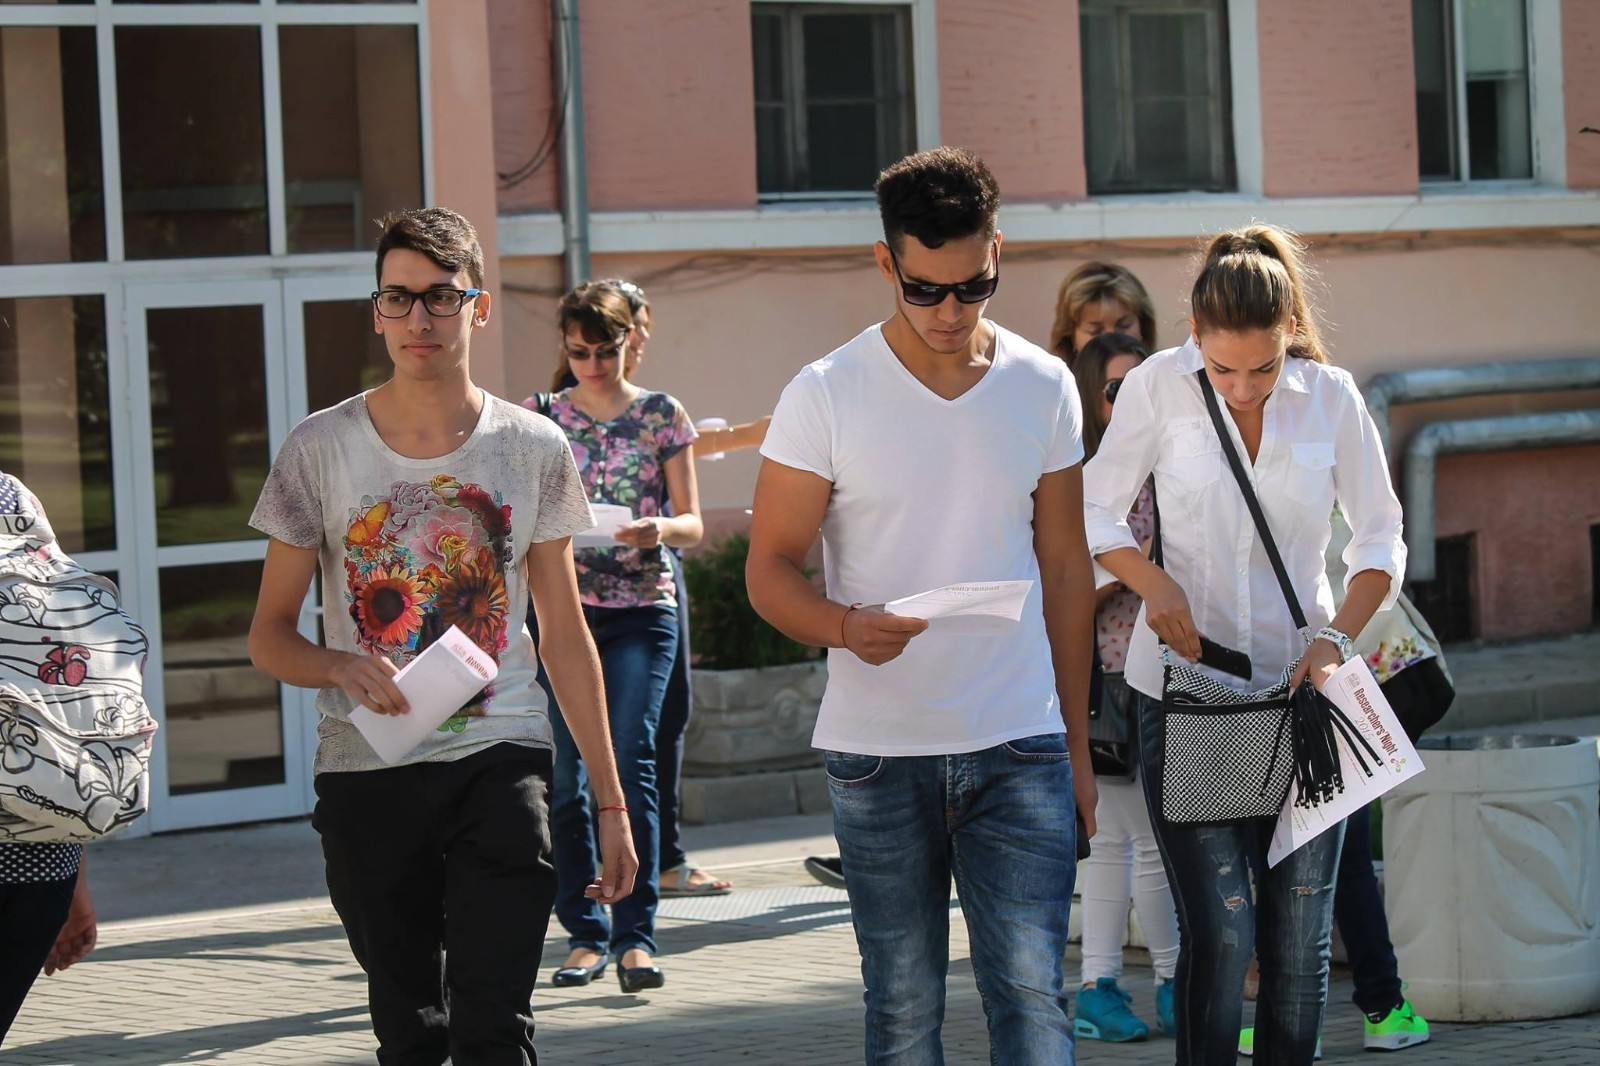 Студенти пред Аудиторен комплекс на Медицински университет - Пловдив